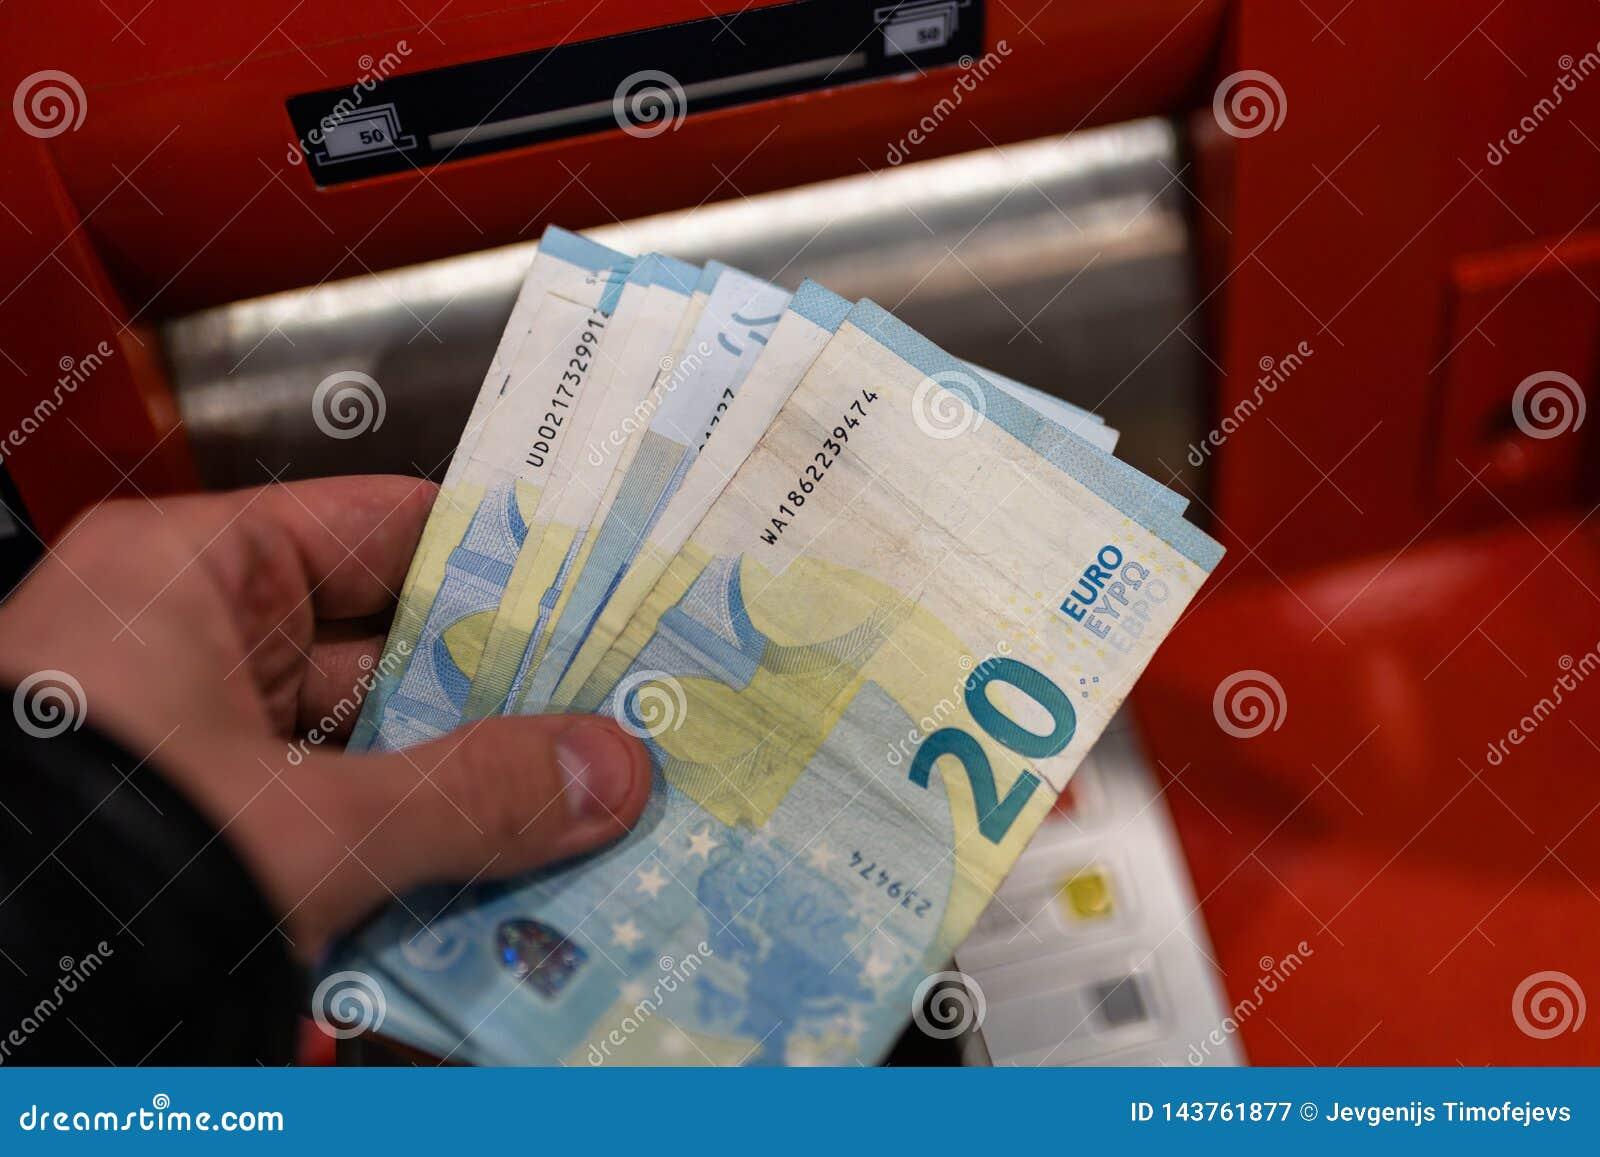 Можно ли взять кредит в сбербанк онлайн